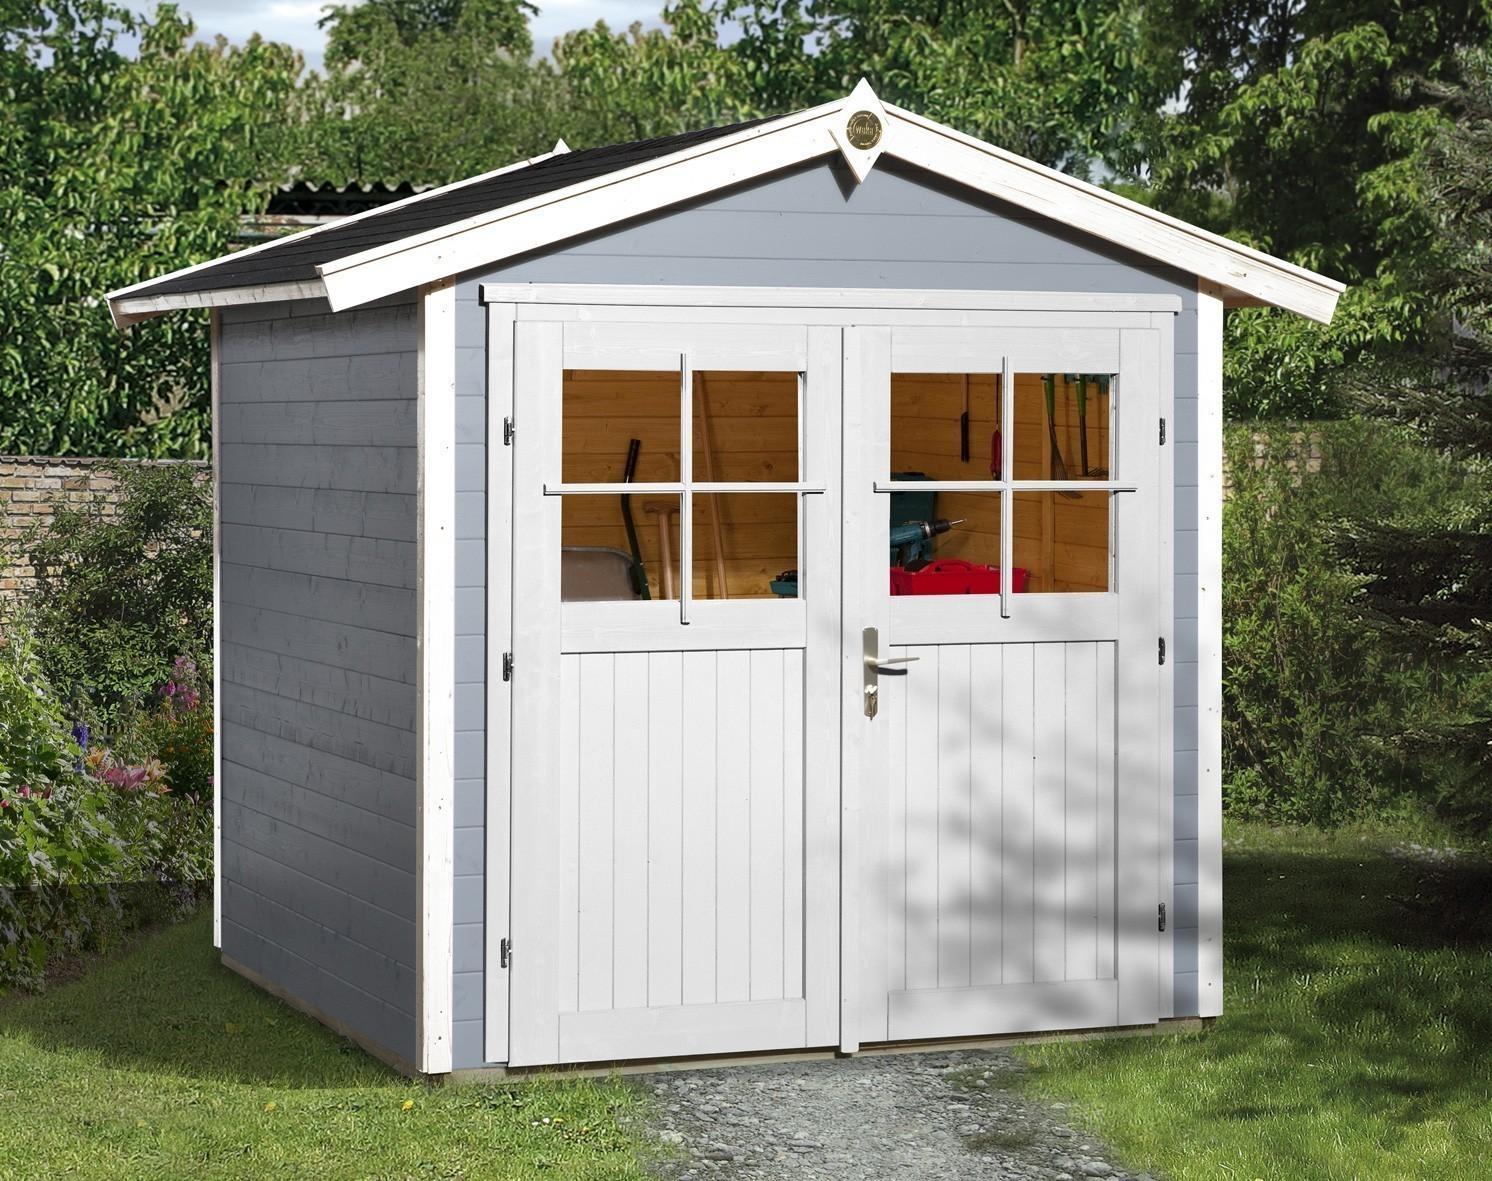 Weka Gerätehaus 21 mm Gartenhaus 224 Gr. 3 grau 280x259cm Doppeltüre Bild 1